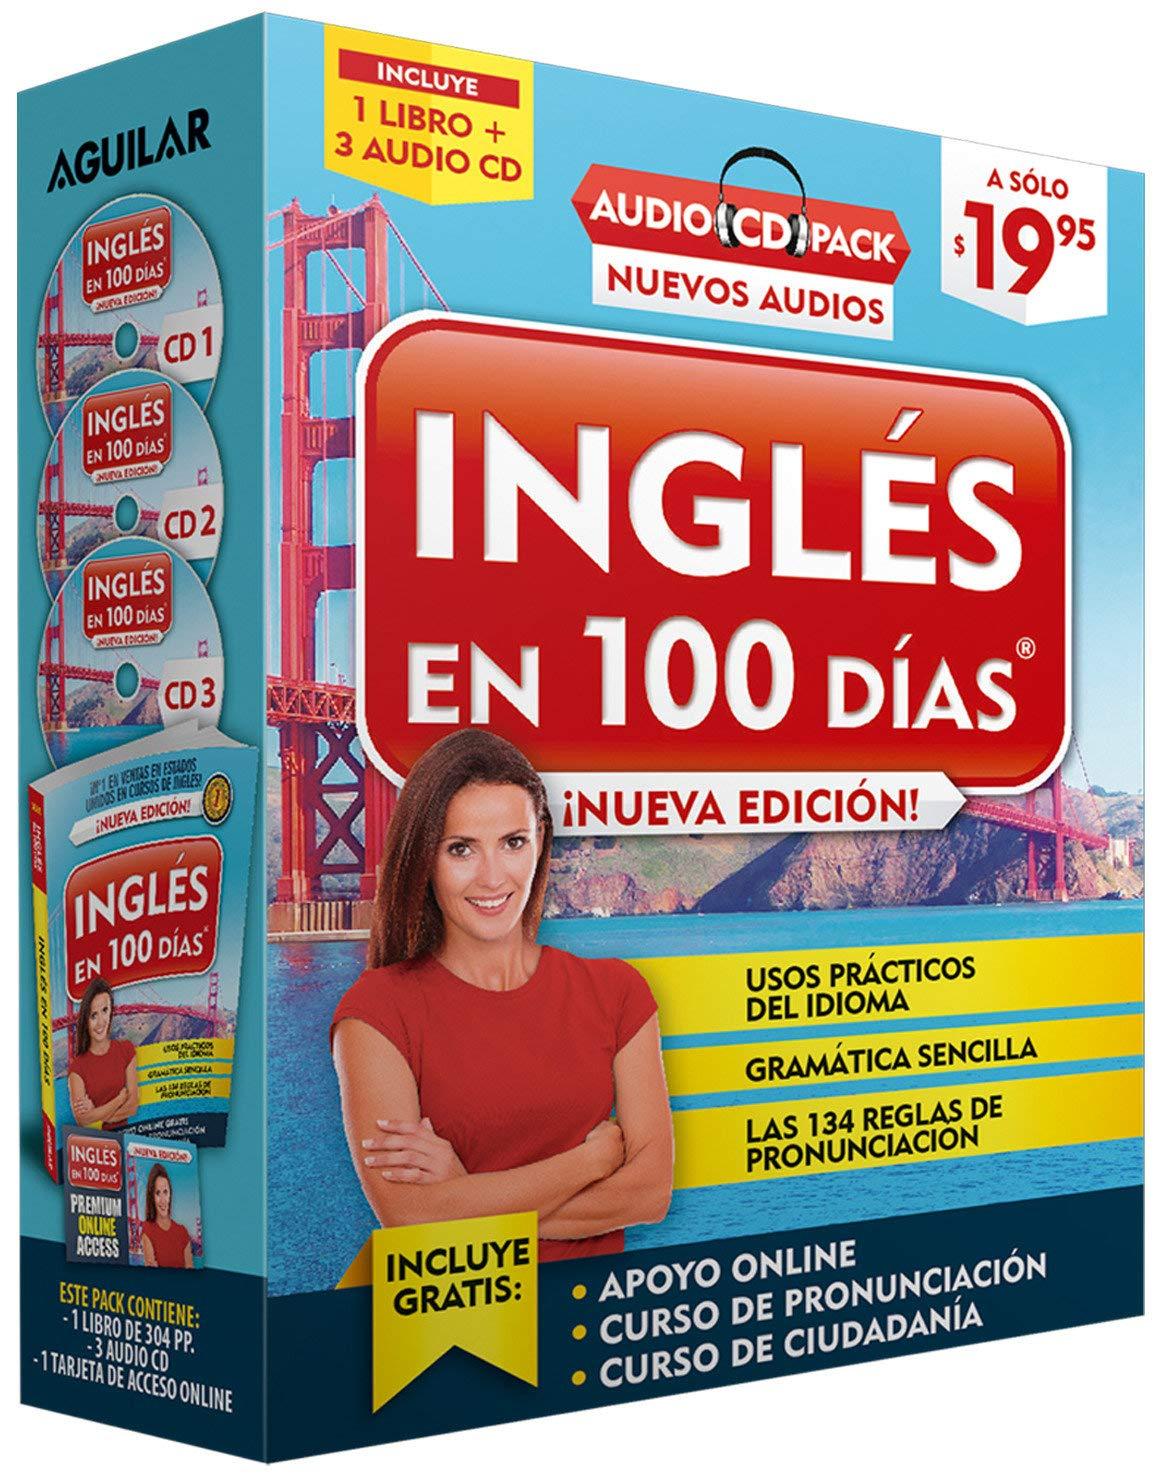 Ingles En 100 Dias Curso De Ingles Audio Pack Libro 3 Cd S Audio English In 100 Days Audio Pack Spanish Edition Ingles En 100 Dias 9781941999912 Amazon Com Books